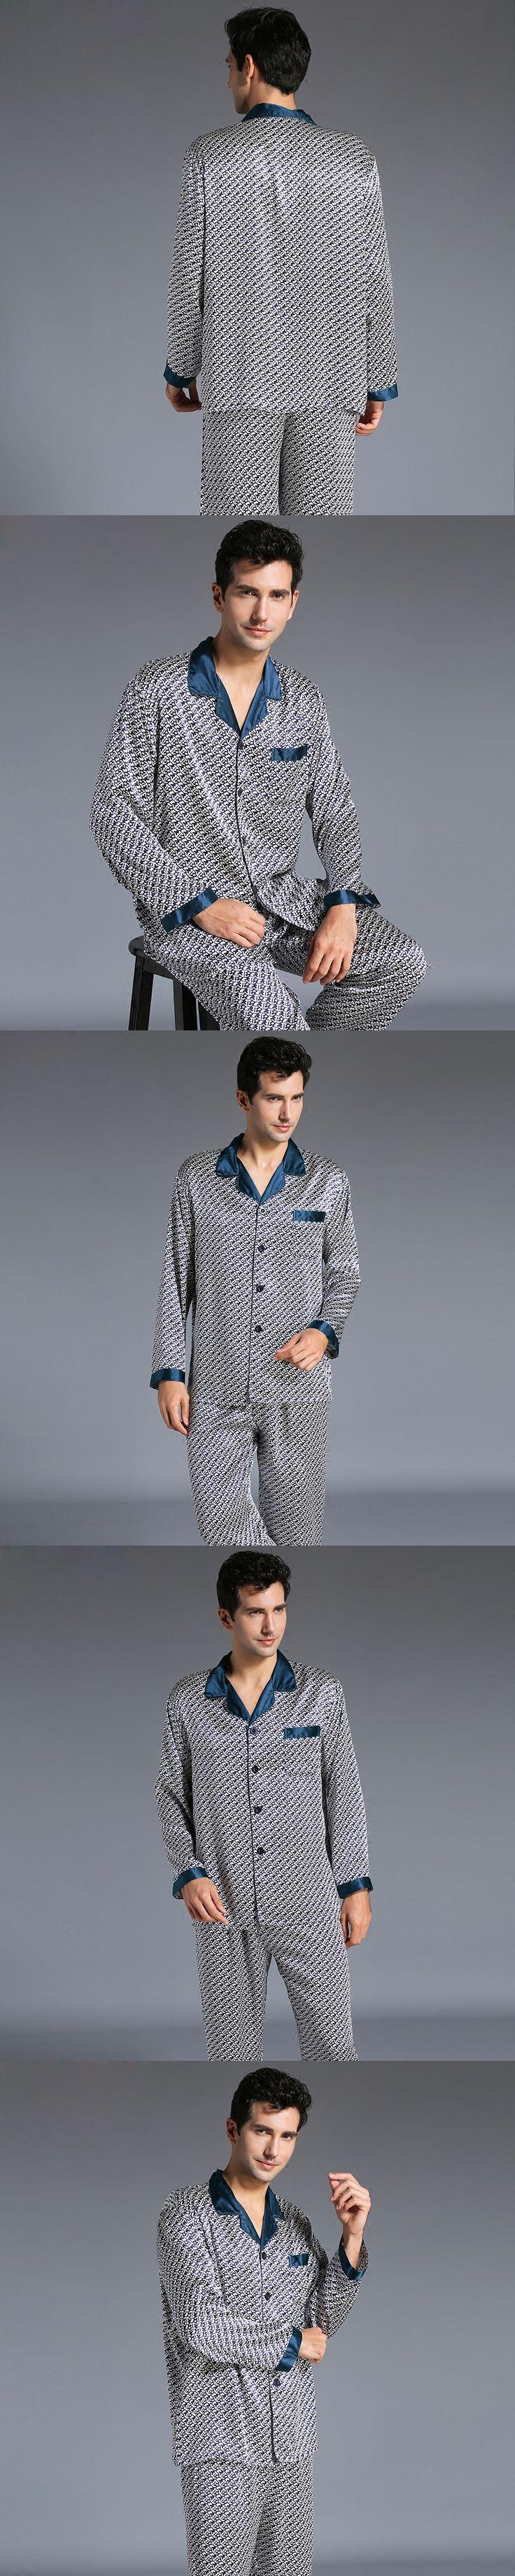 New Arrival Fashion Men Silk Pajamas Set Pyjamas Set Male Printed Long-Sleeved Sleepwear Soft Cozy For Sleep Lounge Set